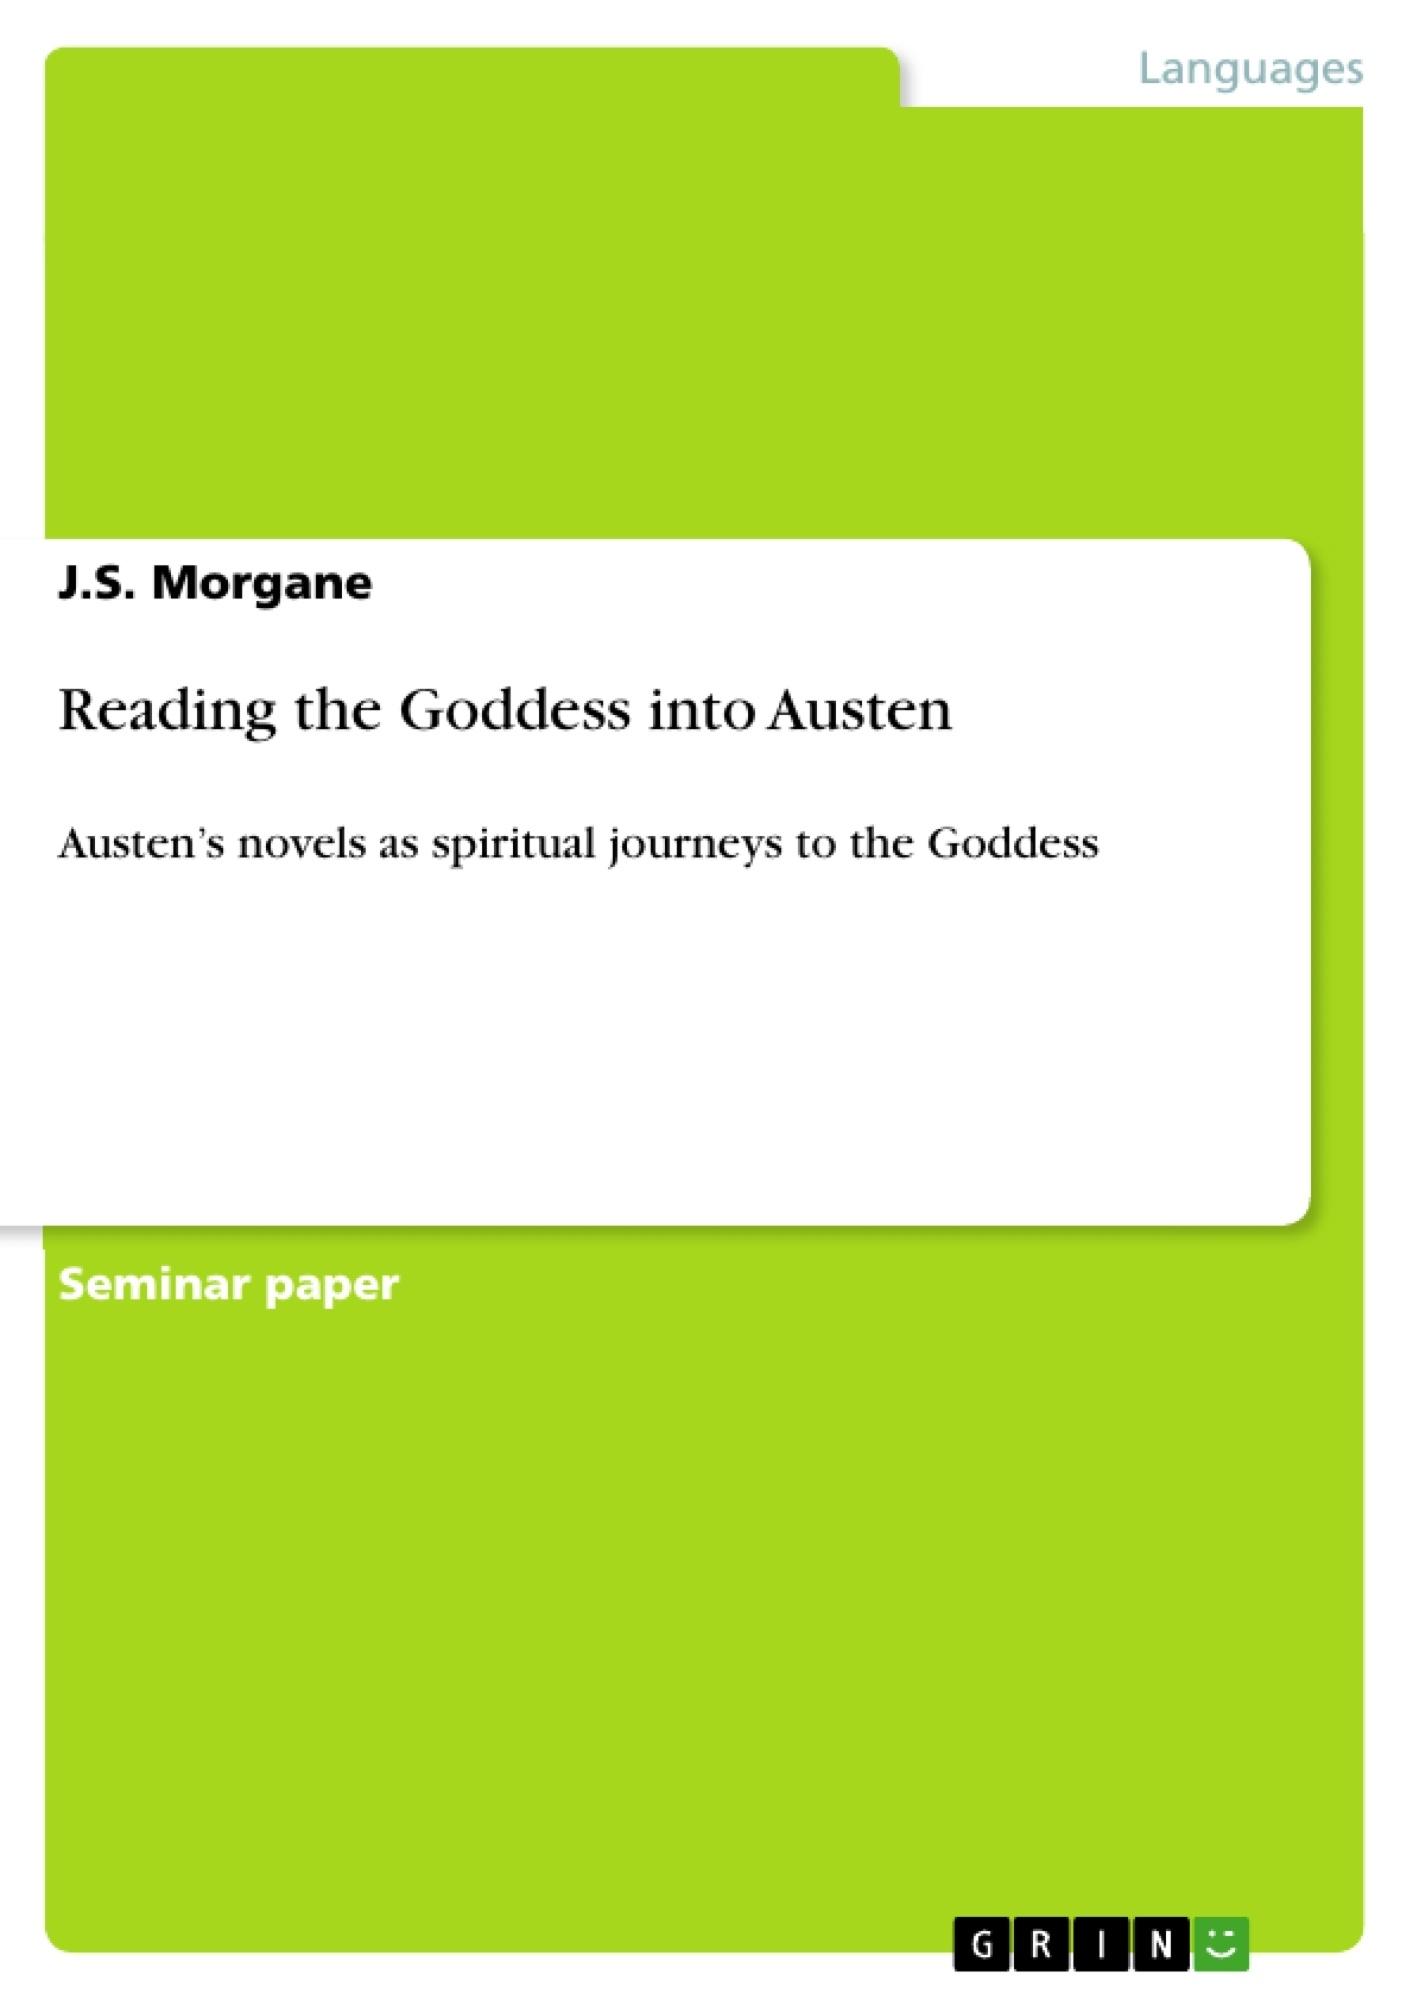 Title: Reading the Goddess into Austen